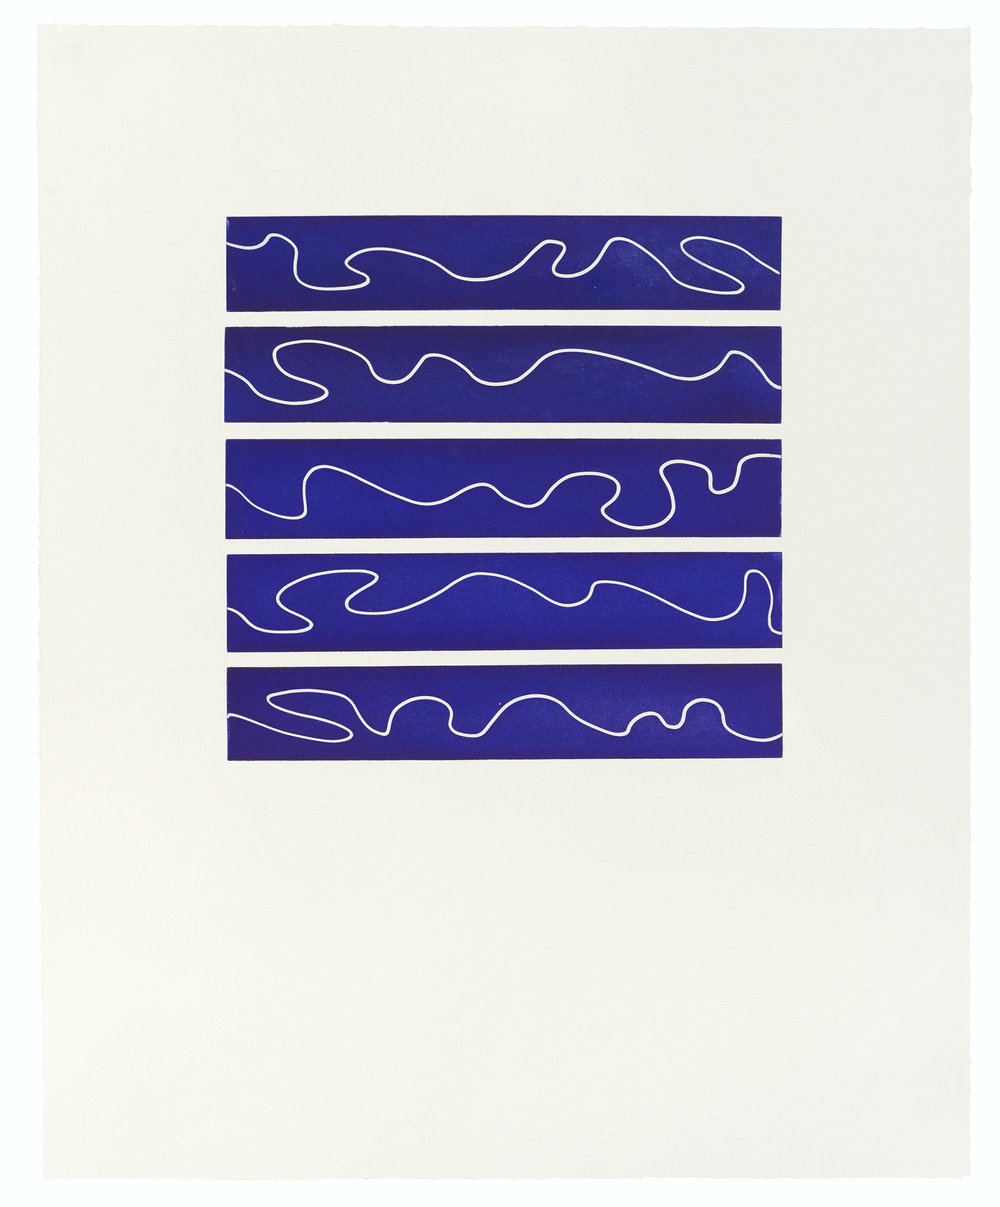 Untitled, 2012, Aquatint, 18 x 26 inches